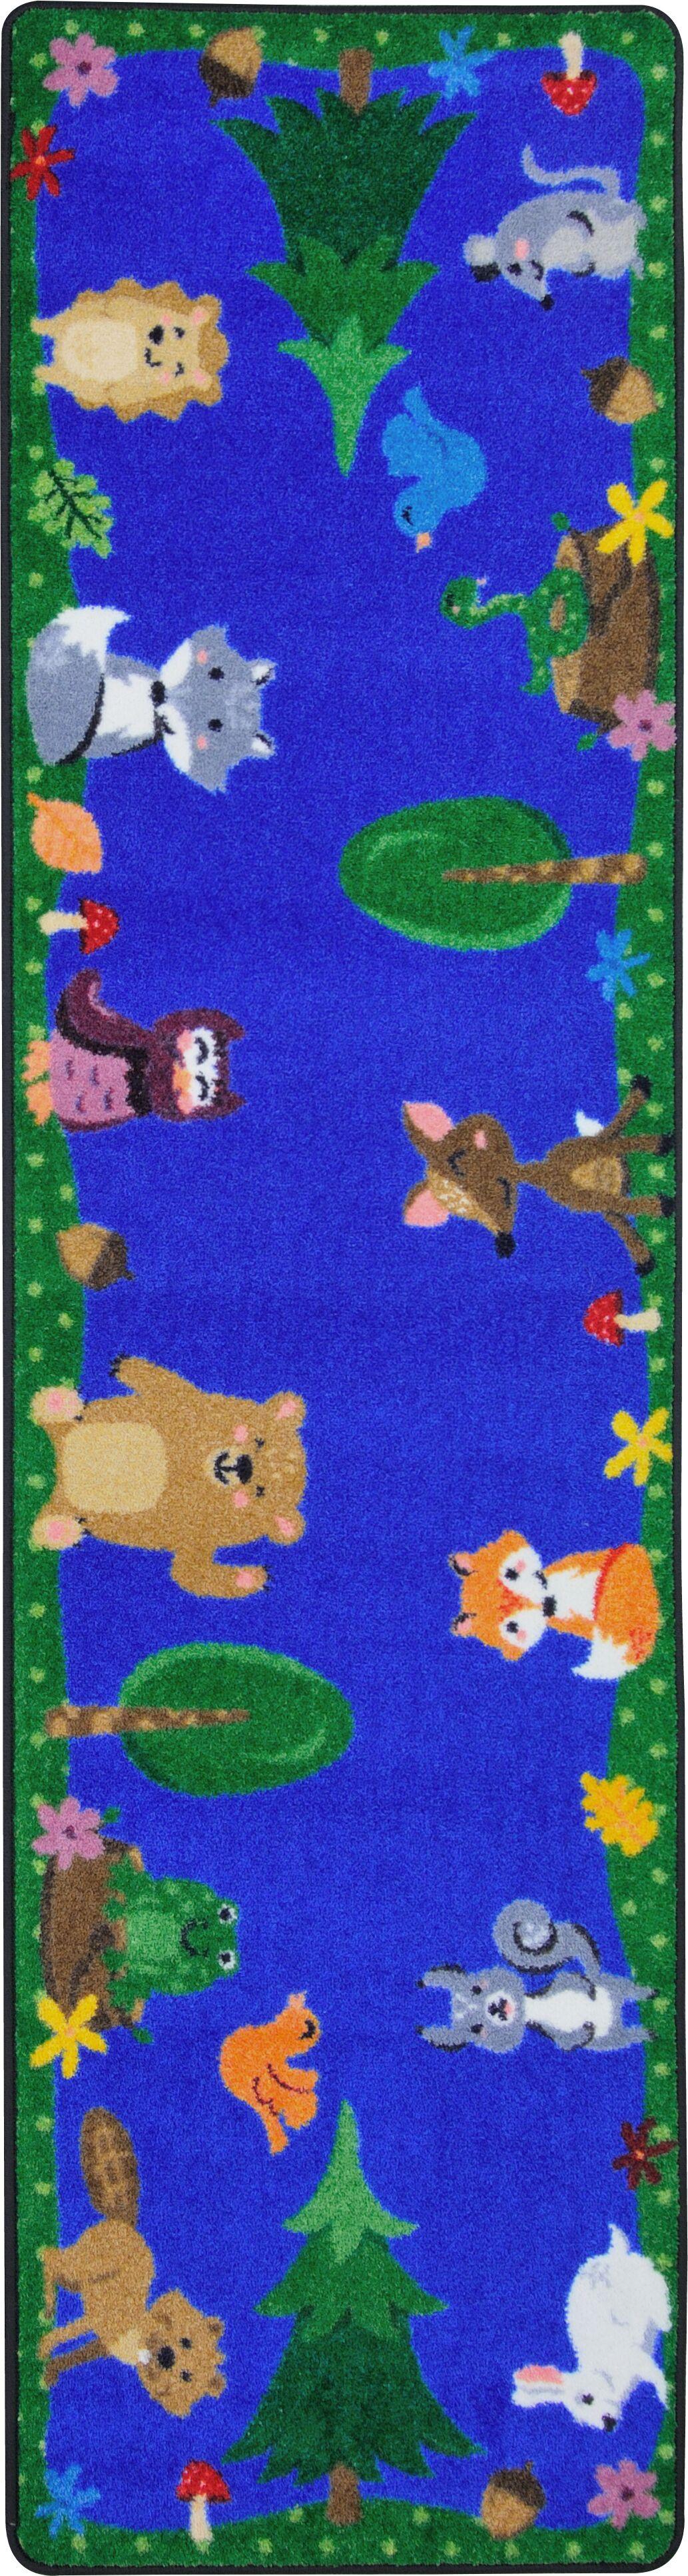 Animals Among Us Blue/Green Area Rug Rug Size: Oval 7'8